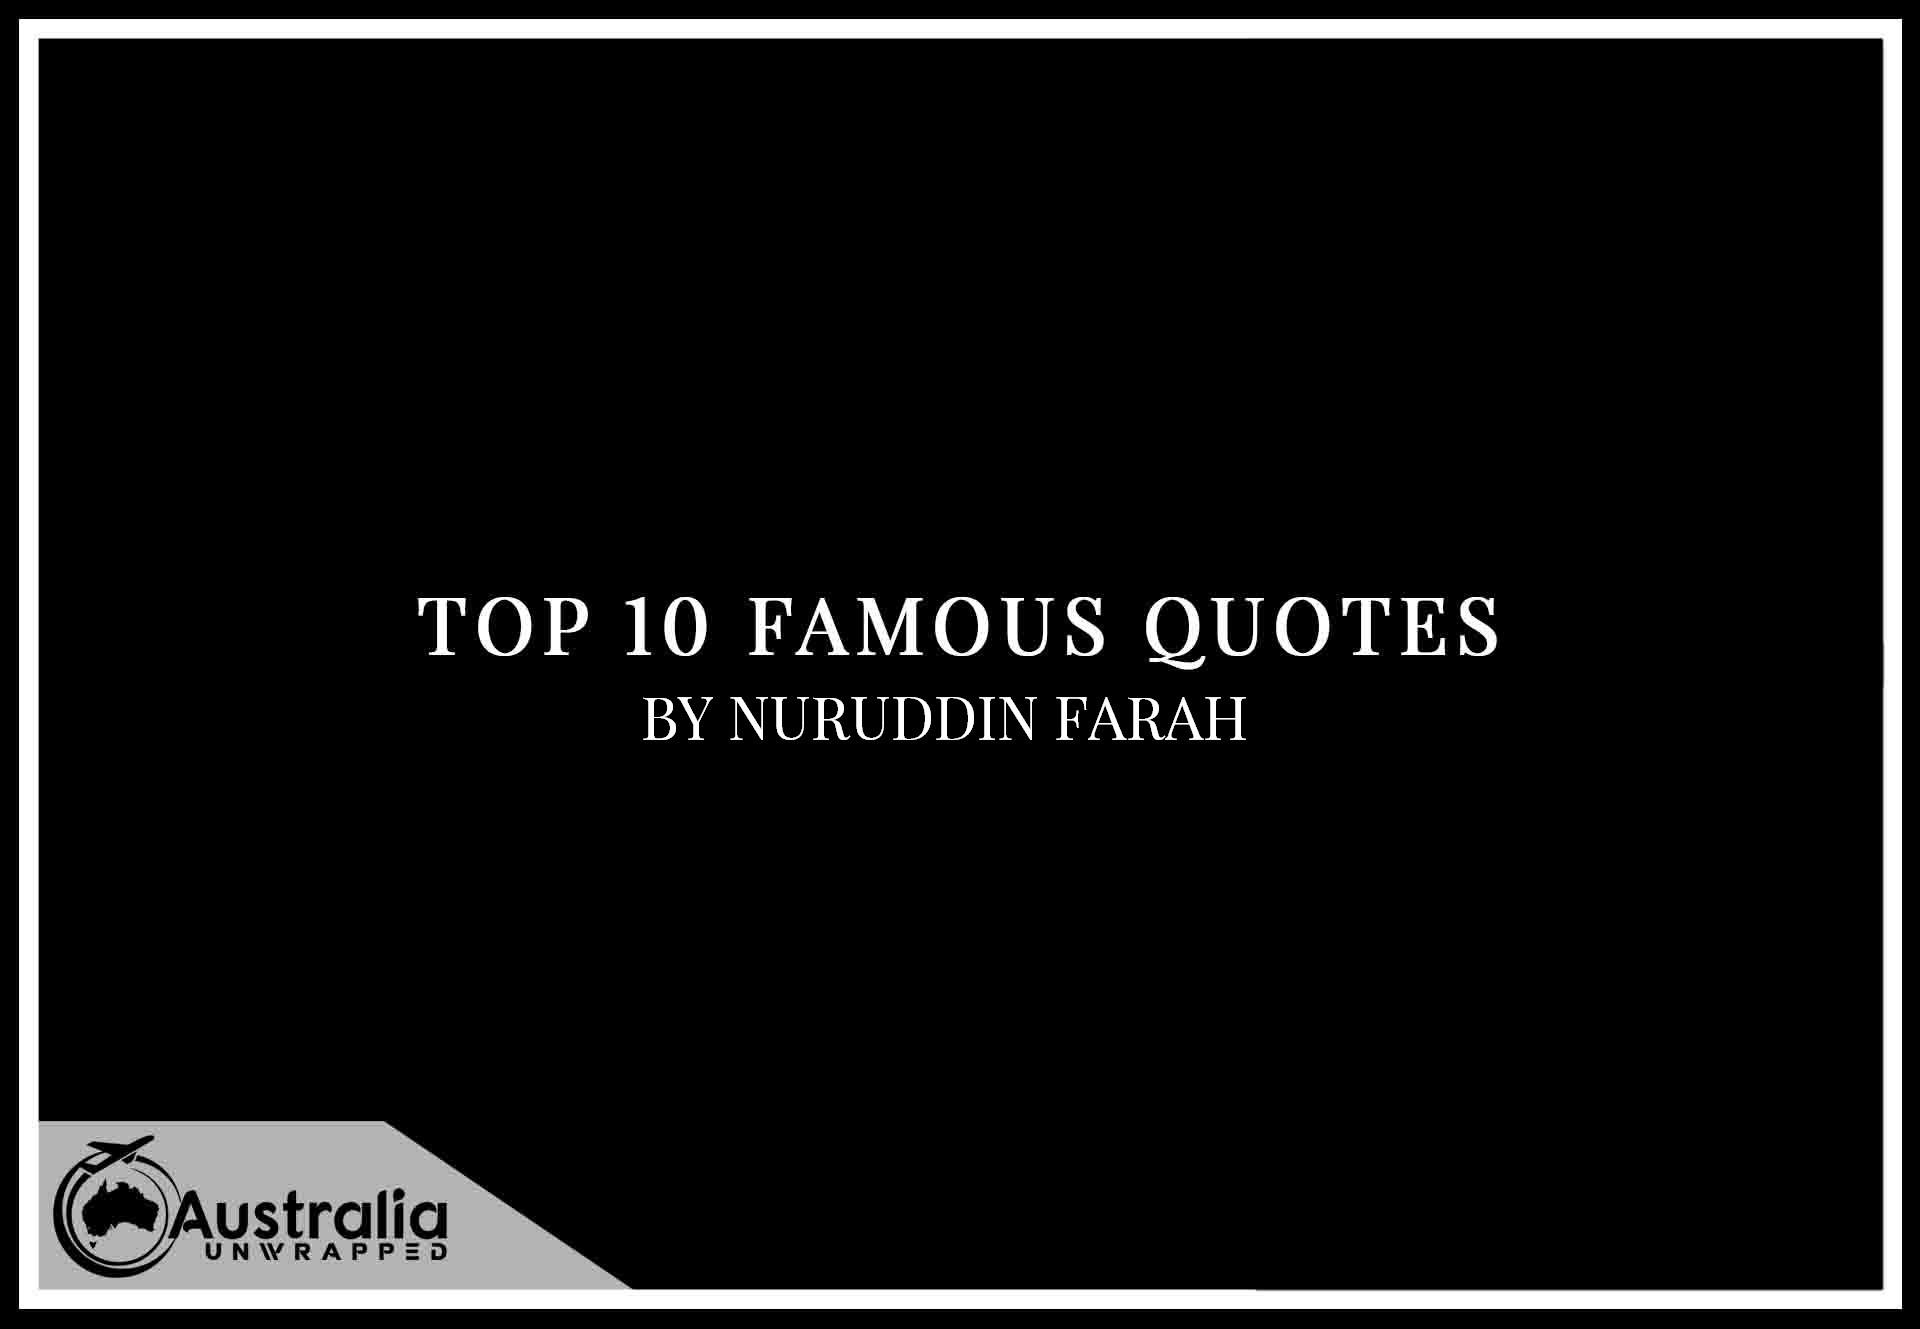 Top 10 Famous Quotes by Author Nuruddin Farah